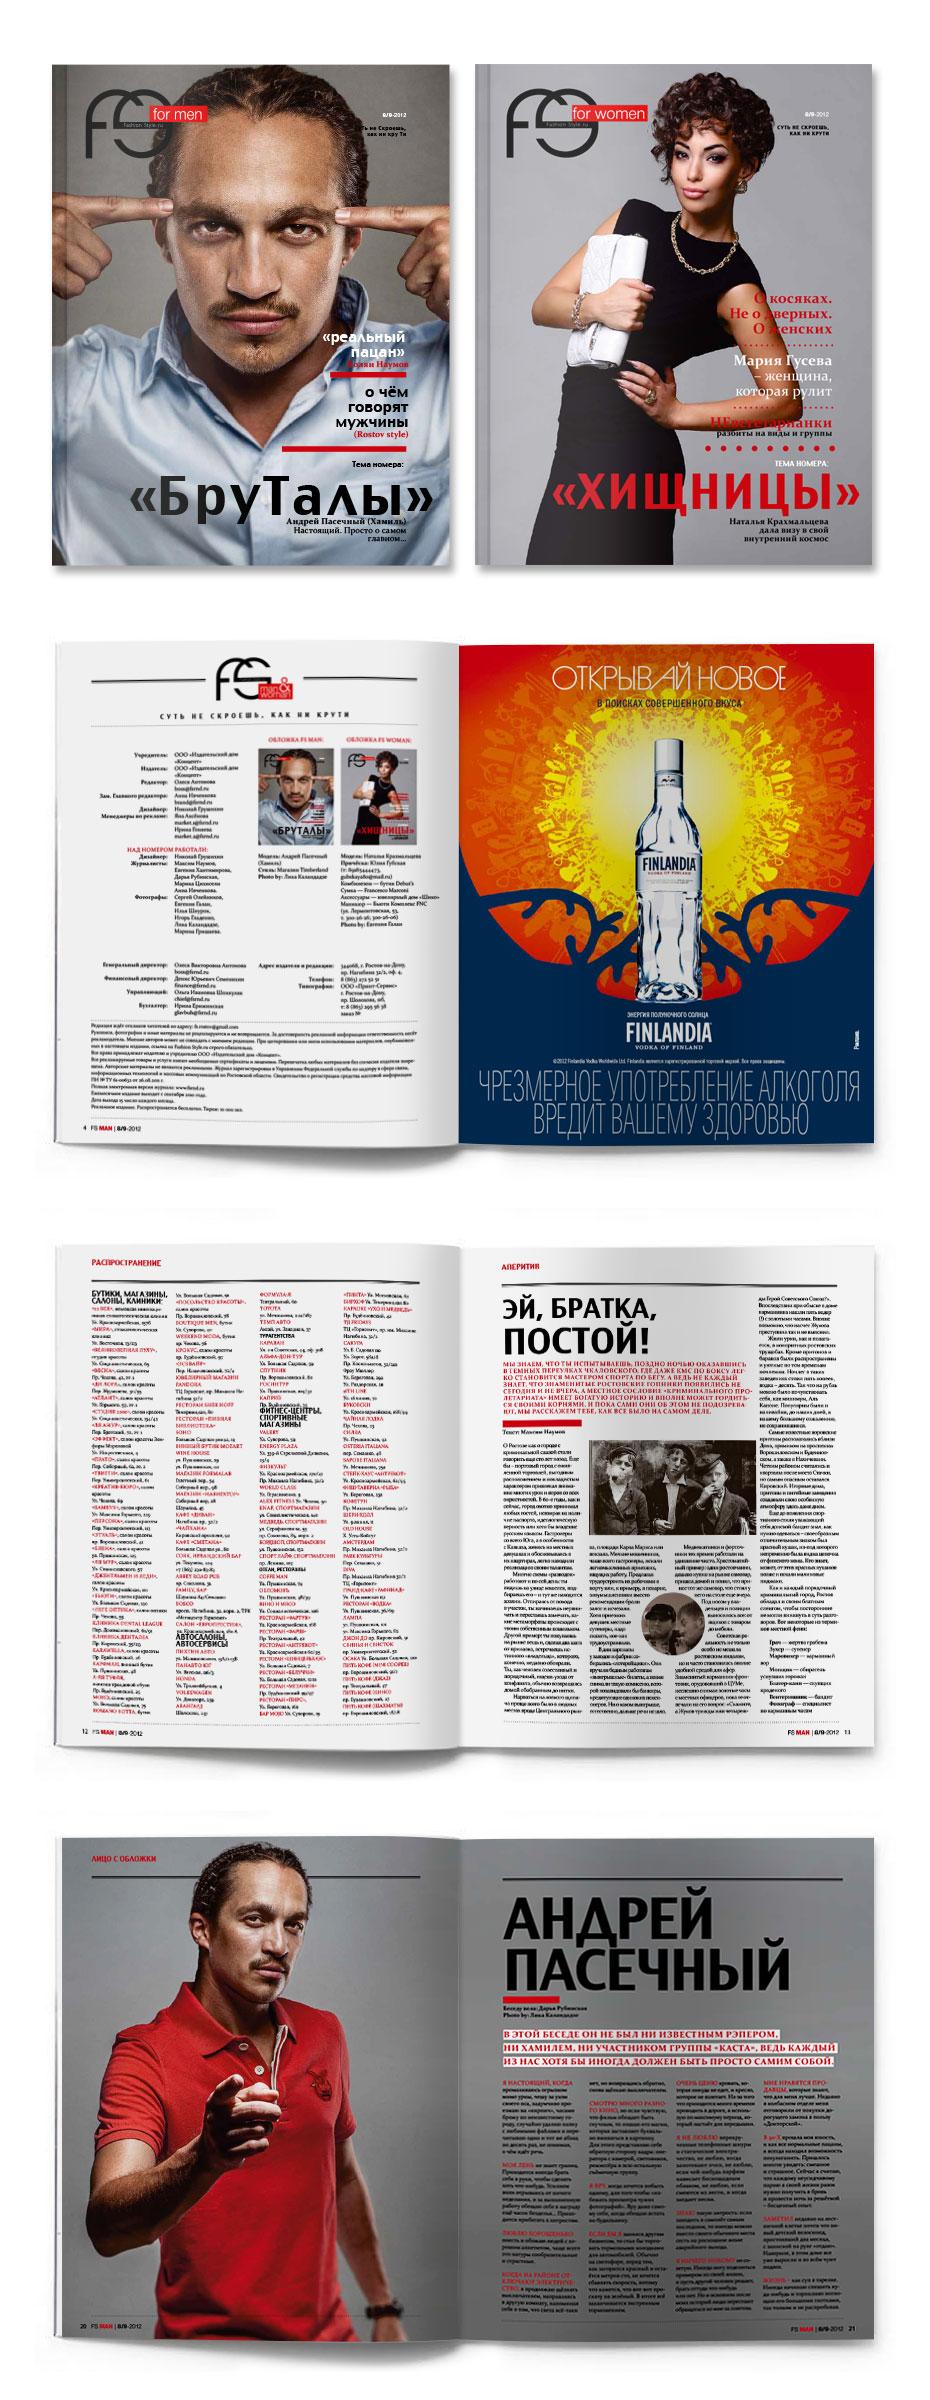 Дизайн и верстка журнала FS for man&woman